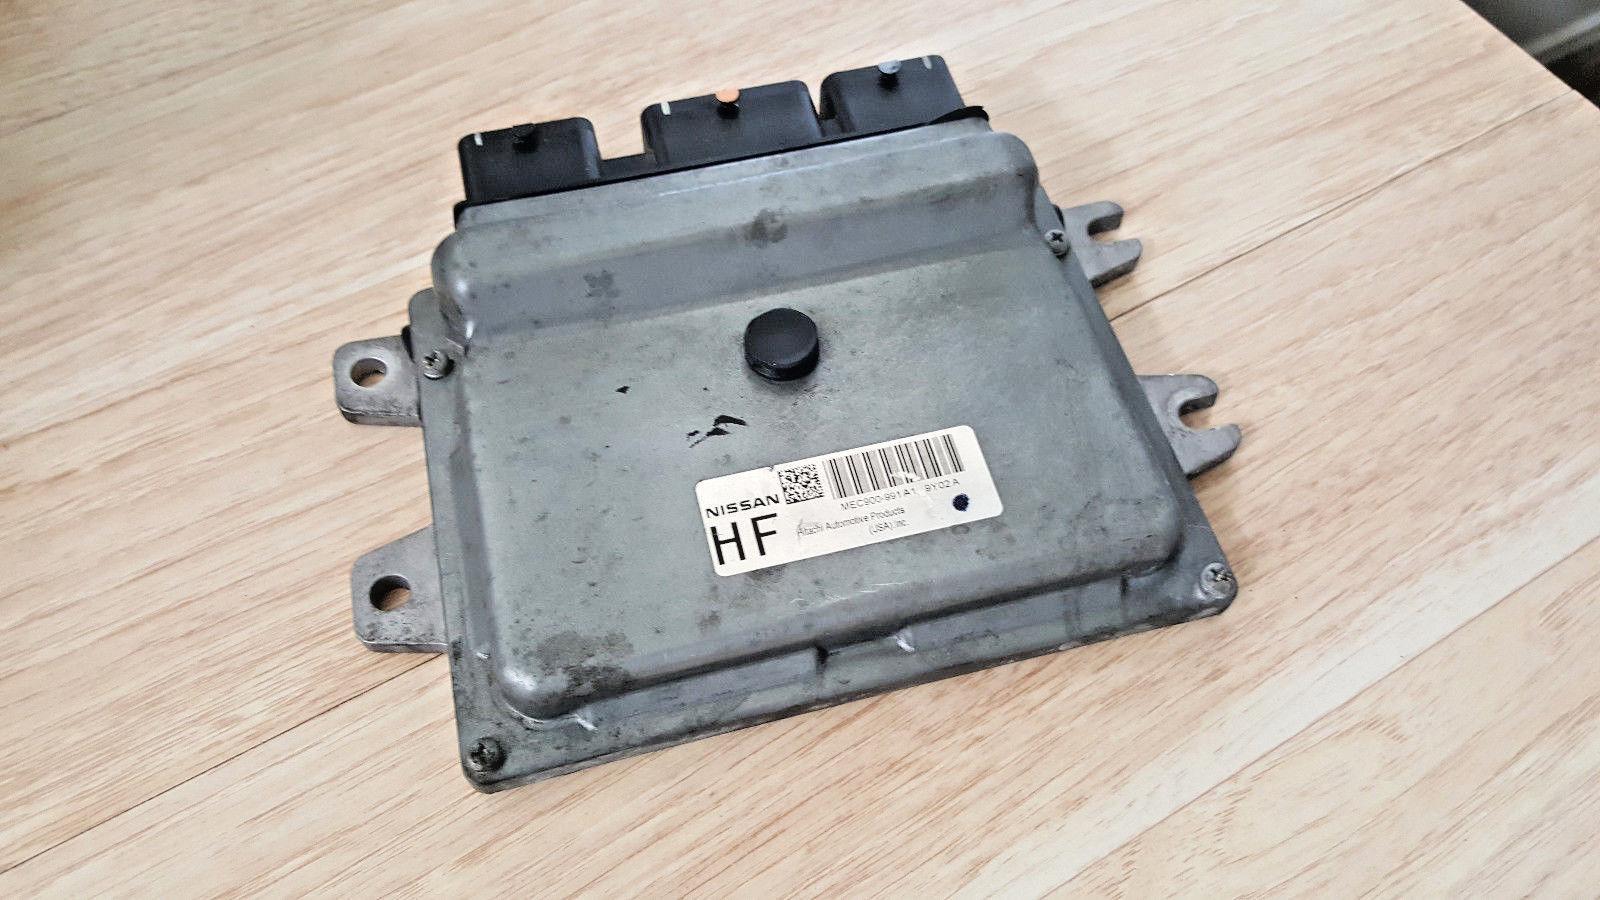 10-11 nissan versa ecu electronic control module mec900-991 mec900991 a1 d1